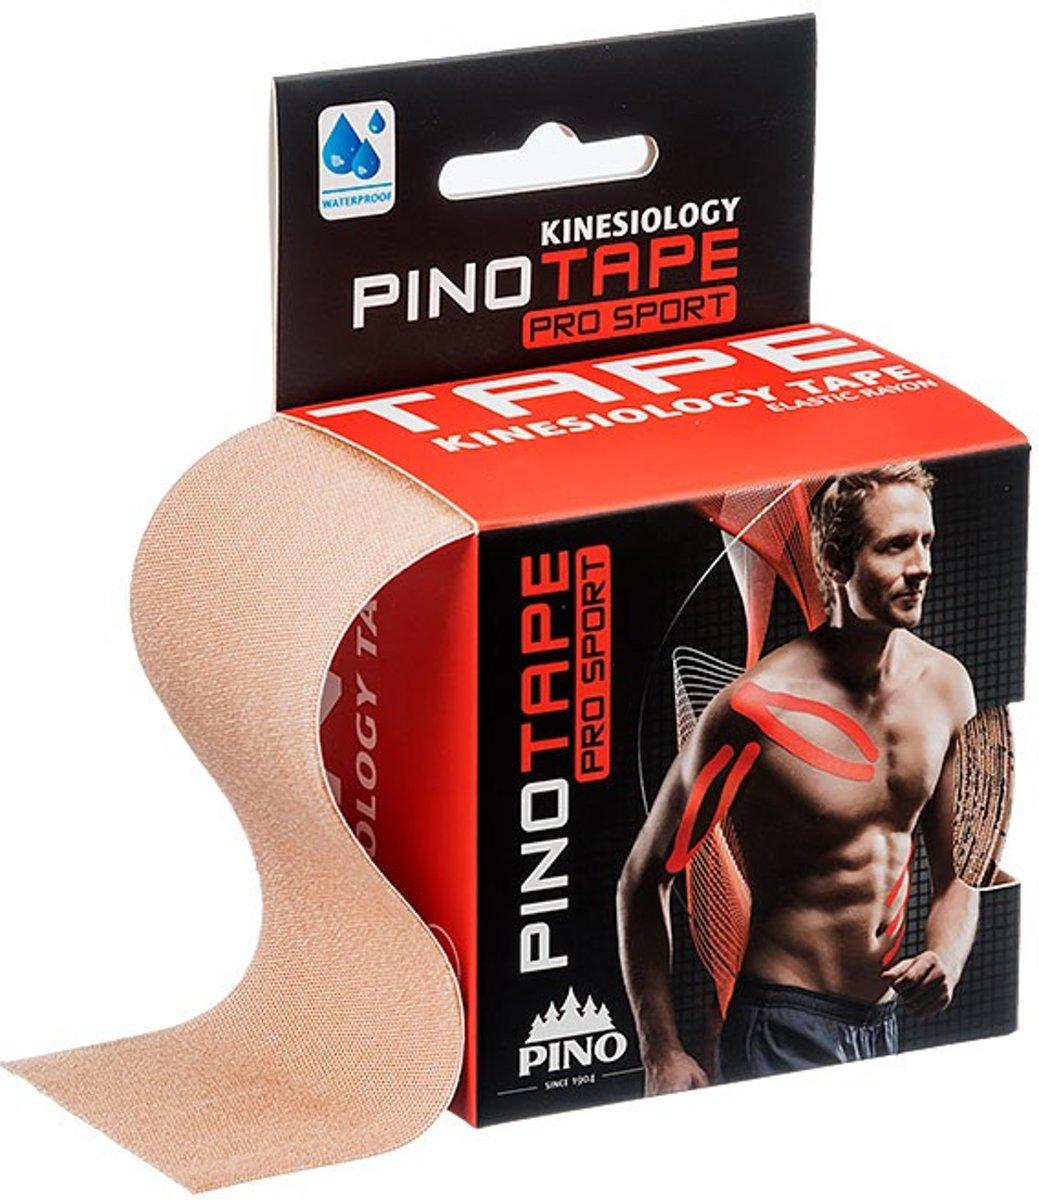 Fysiotape pro sport kinesiology medical tape beige 5cm kopen